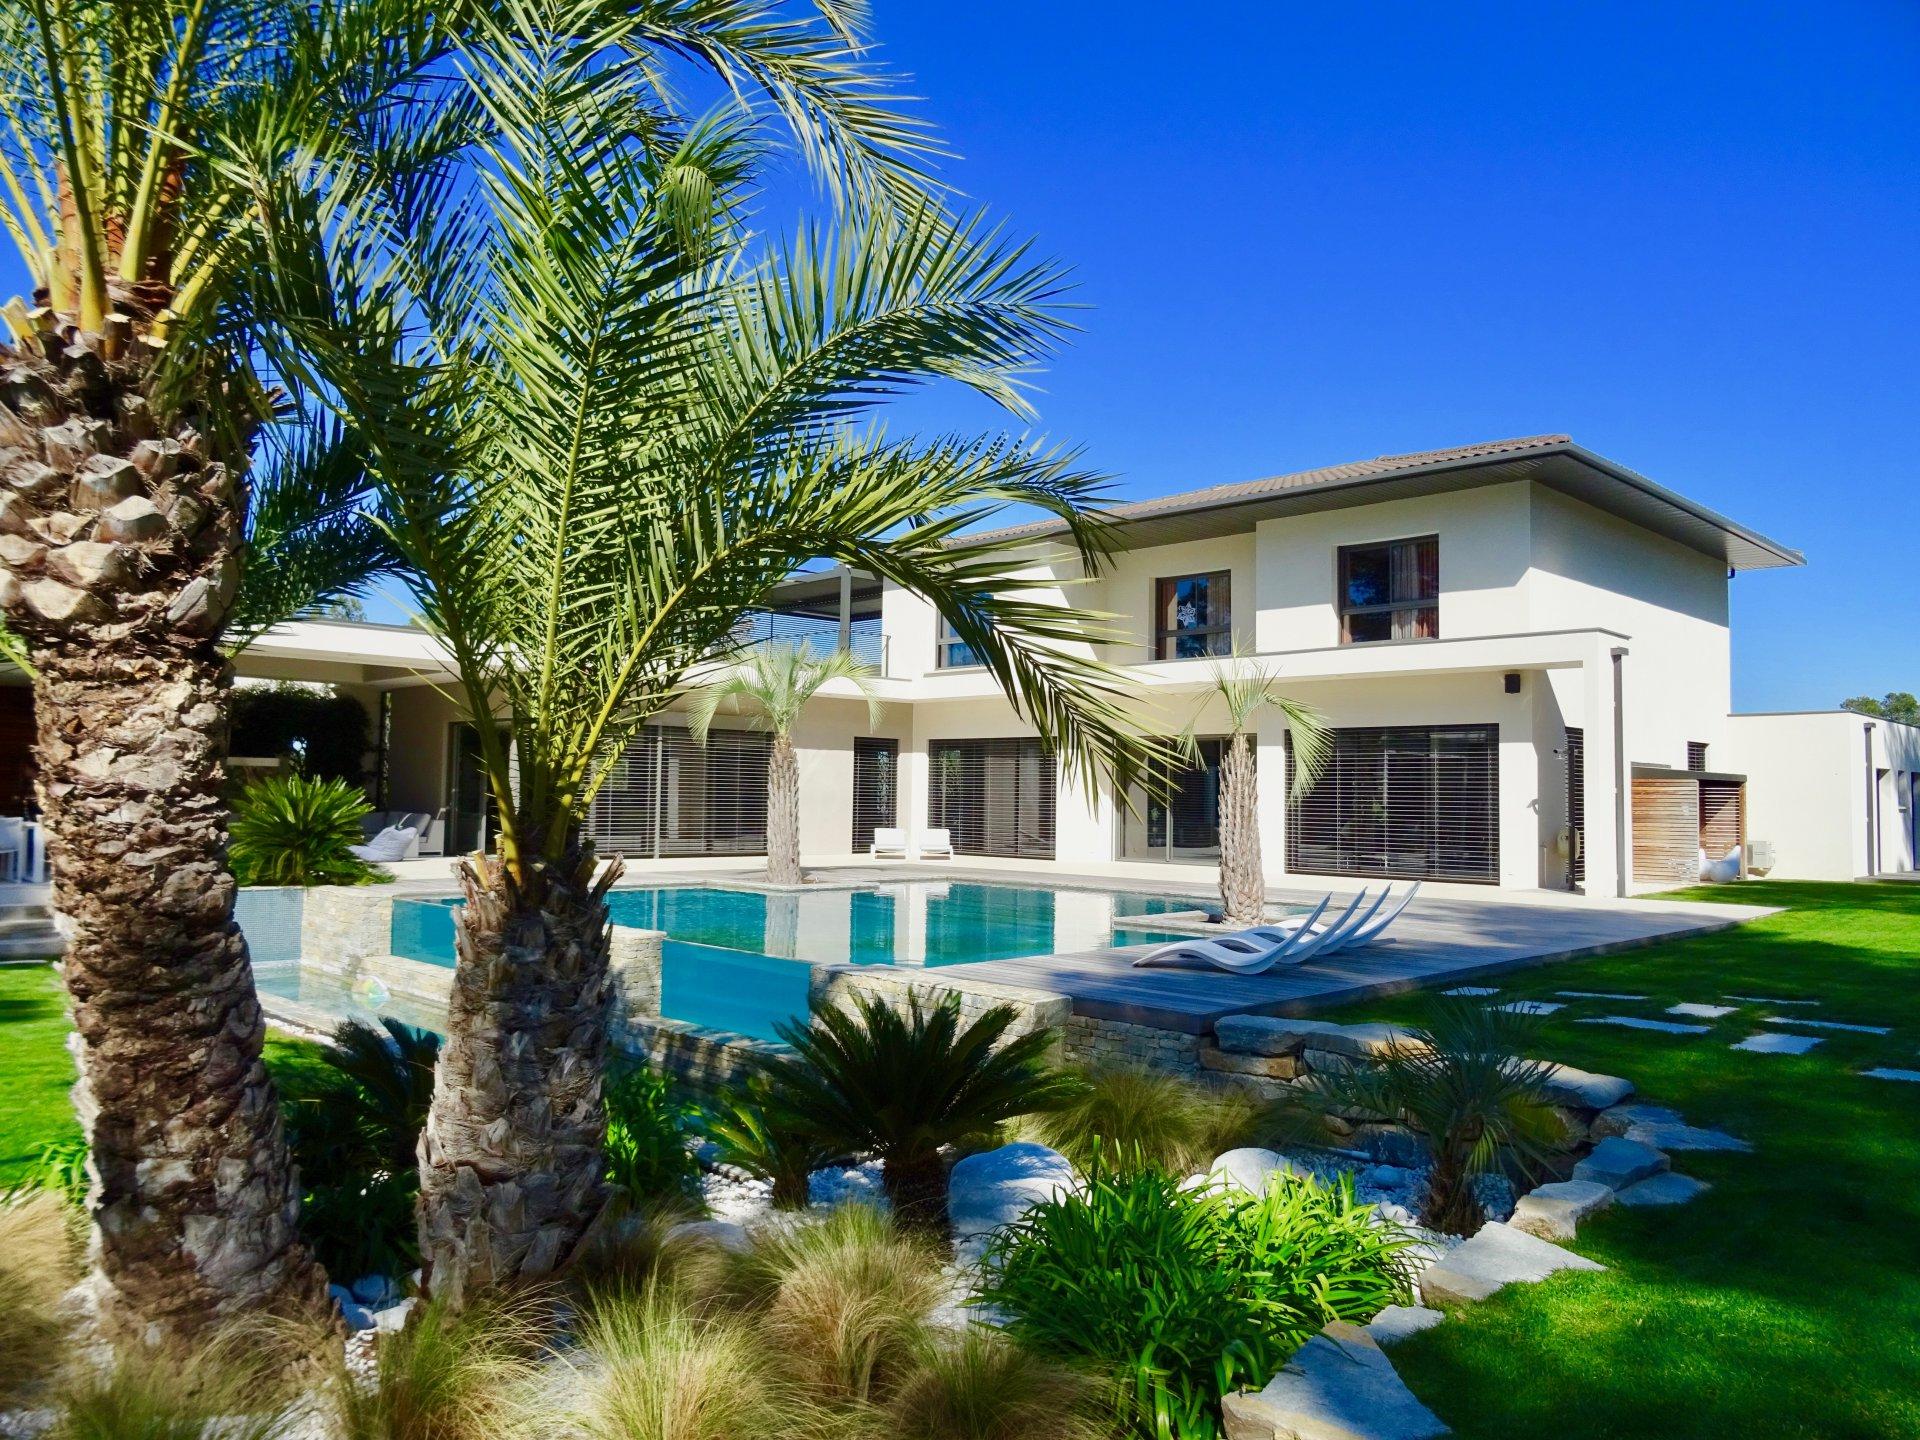 villa ; jardin ; piscine ; prestige ; terrasse ; extérieur